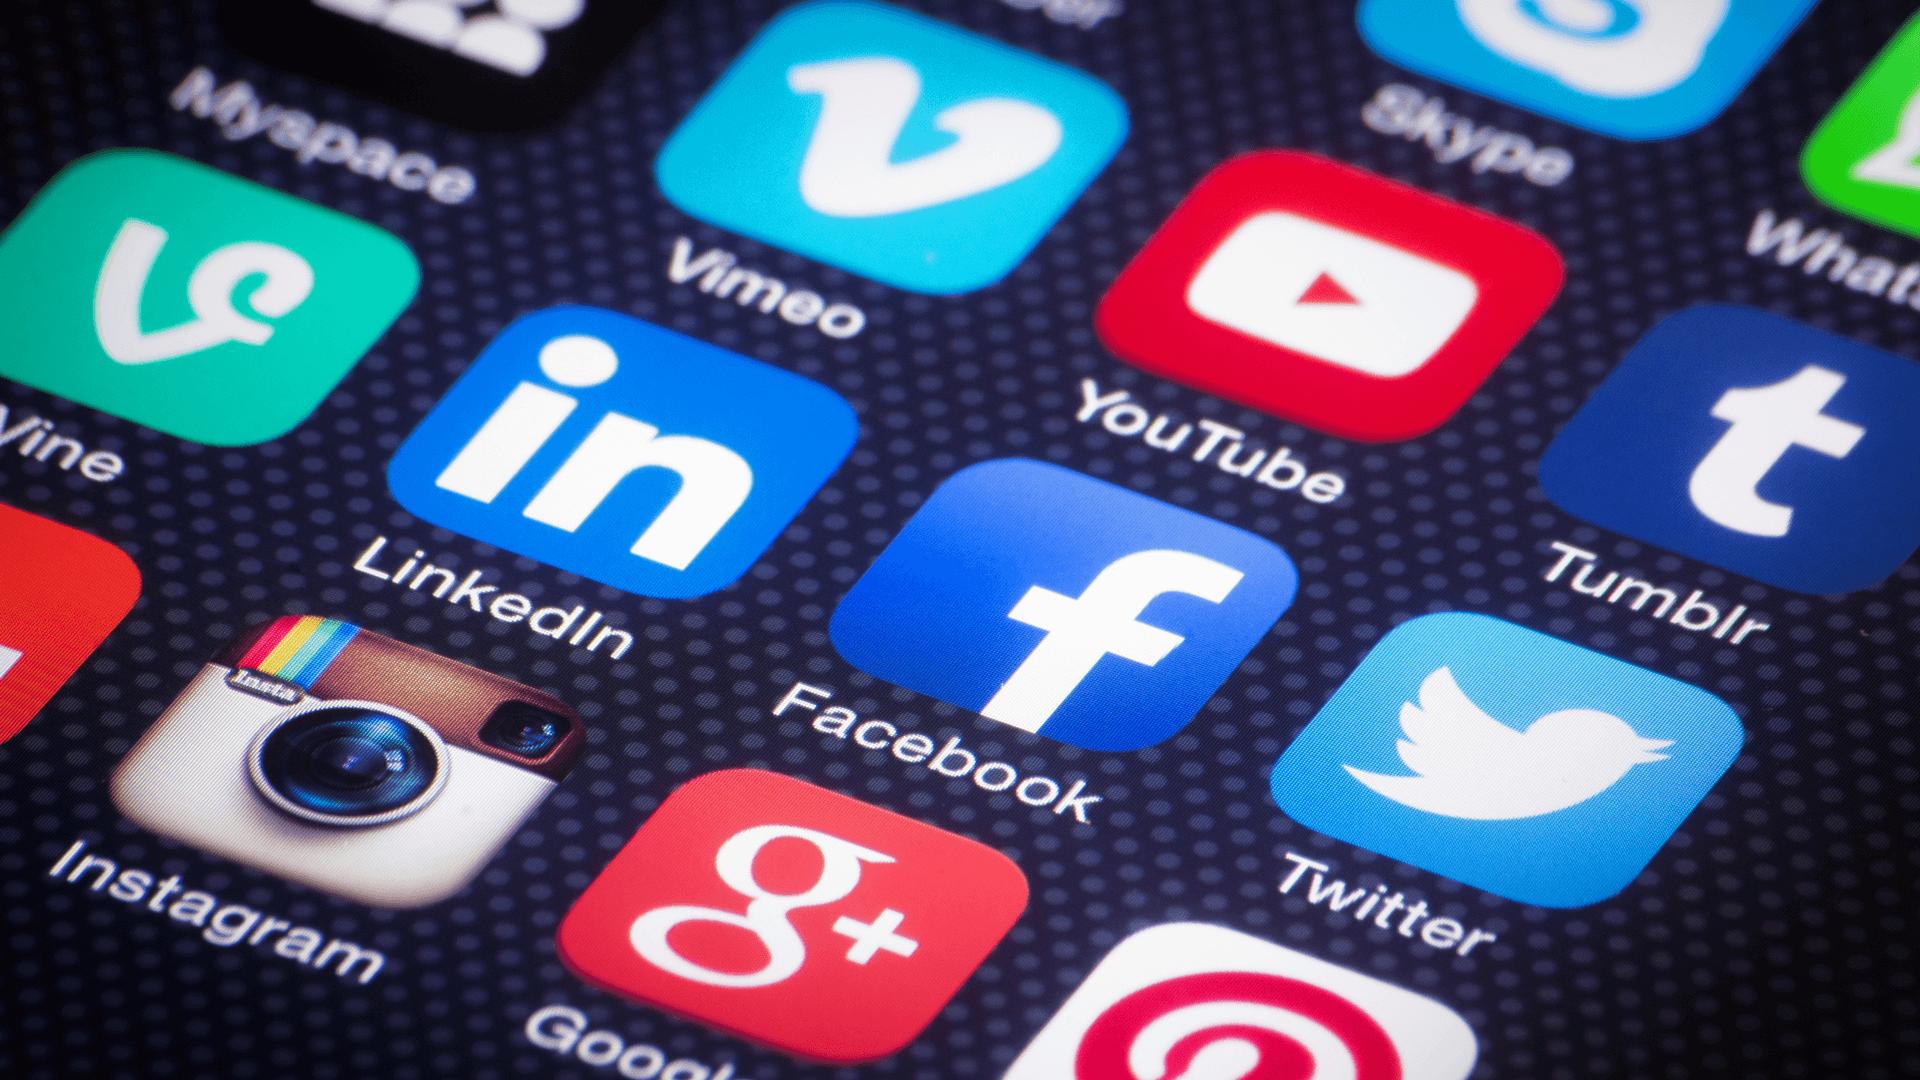 social-mobile-icons-ss-1920_vvefyz